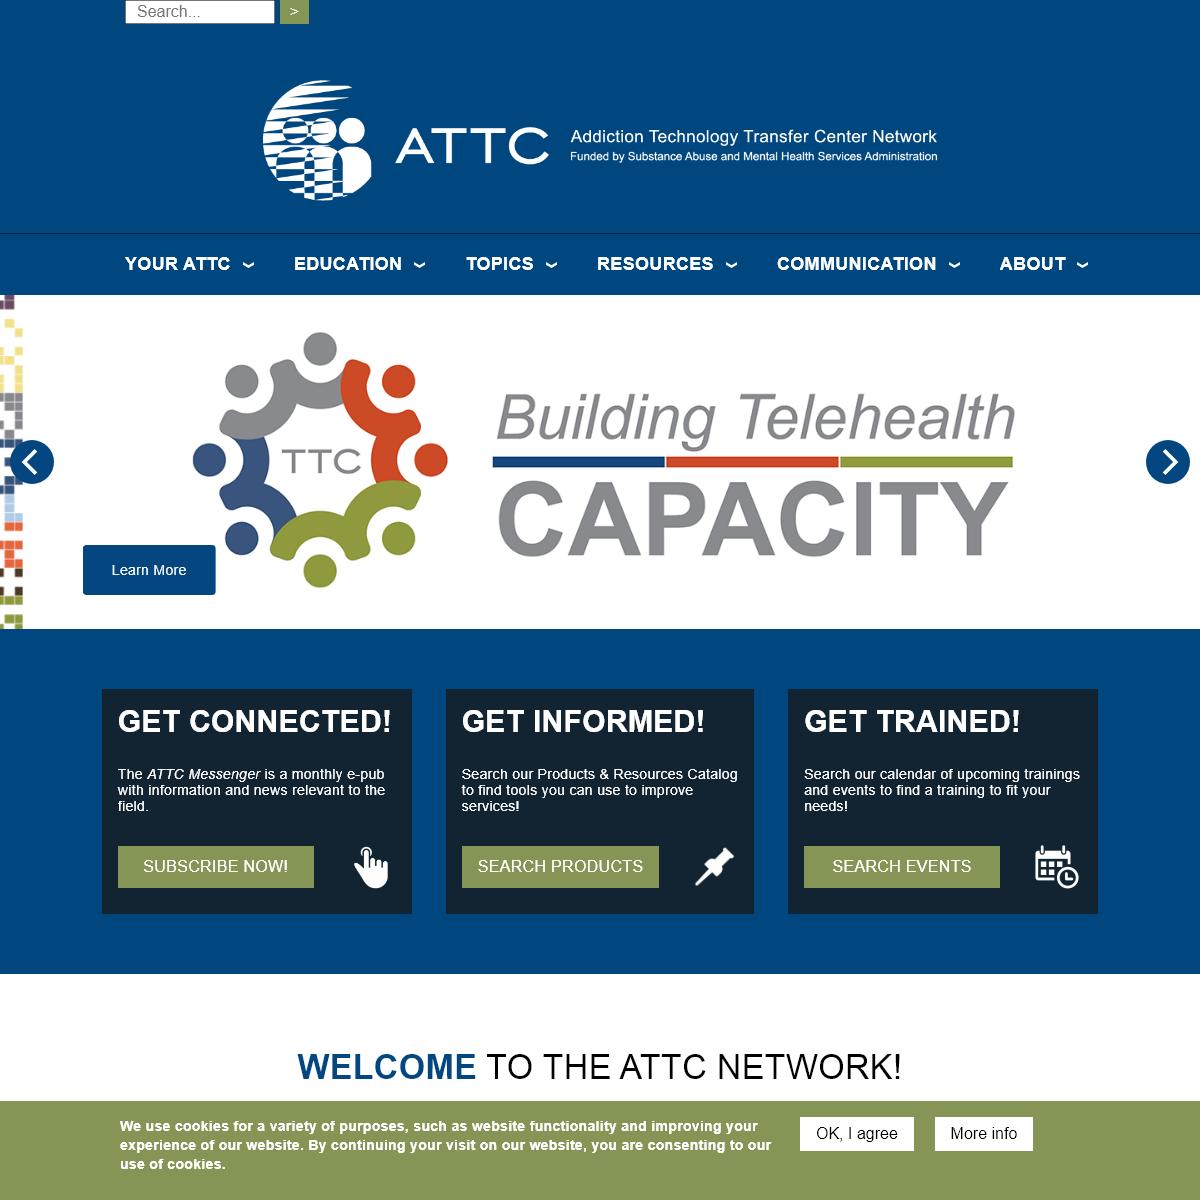 Home - Addiction Technology Transfer Center (ATTC) Network